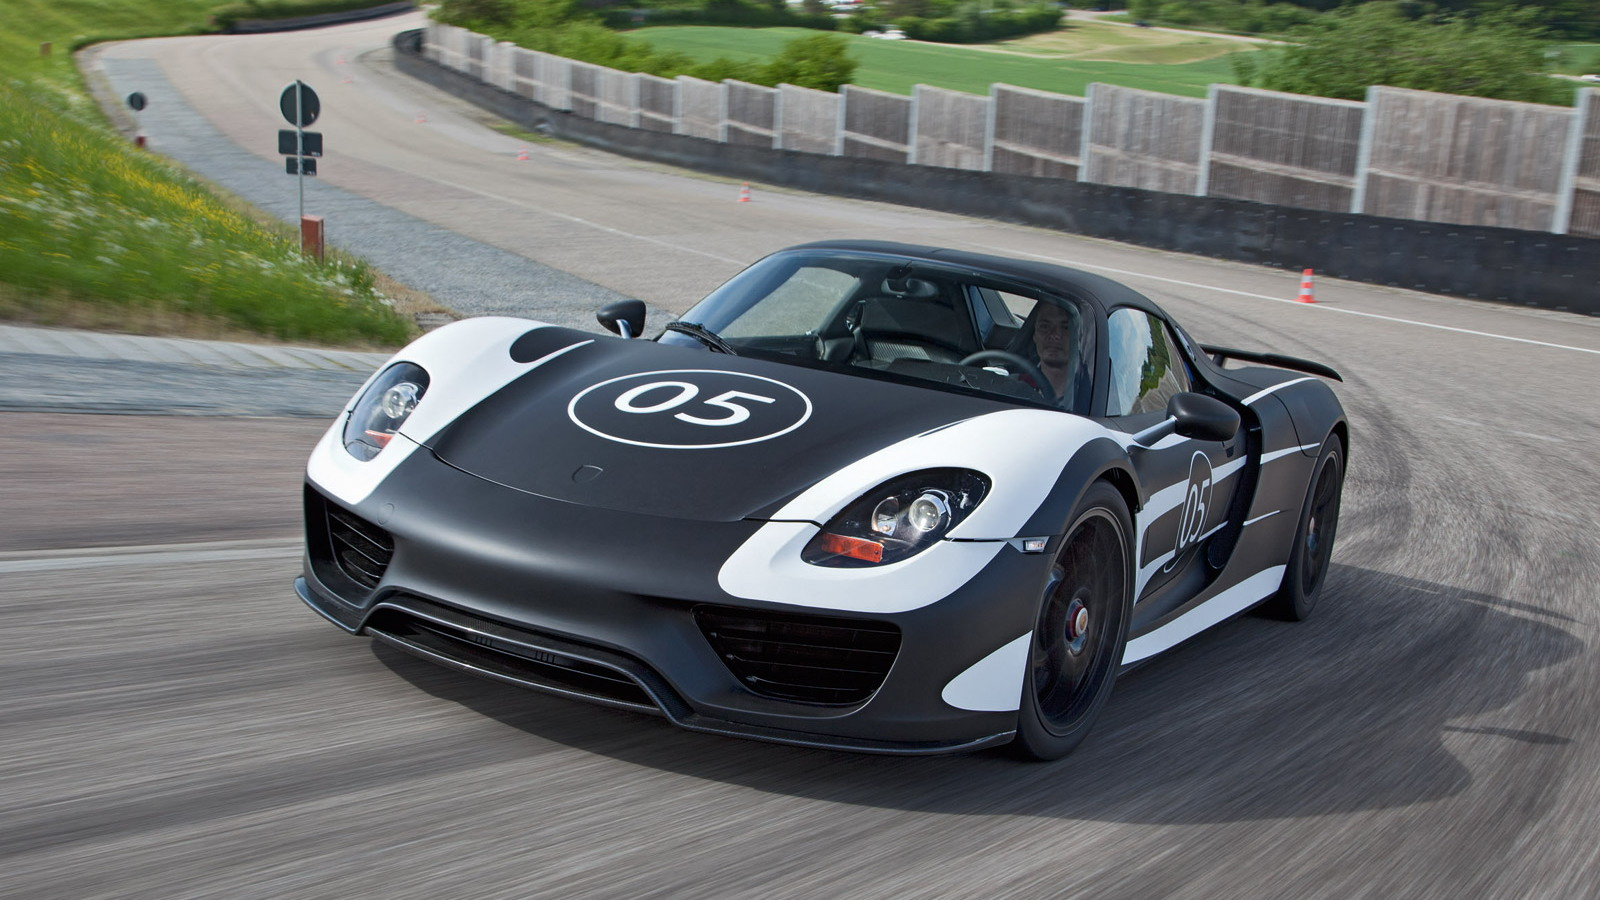 2014 Porsche 918 Spyder prototype